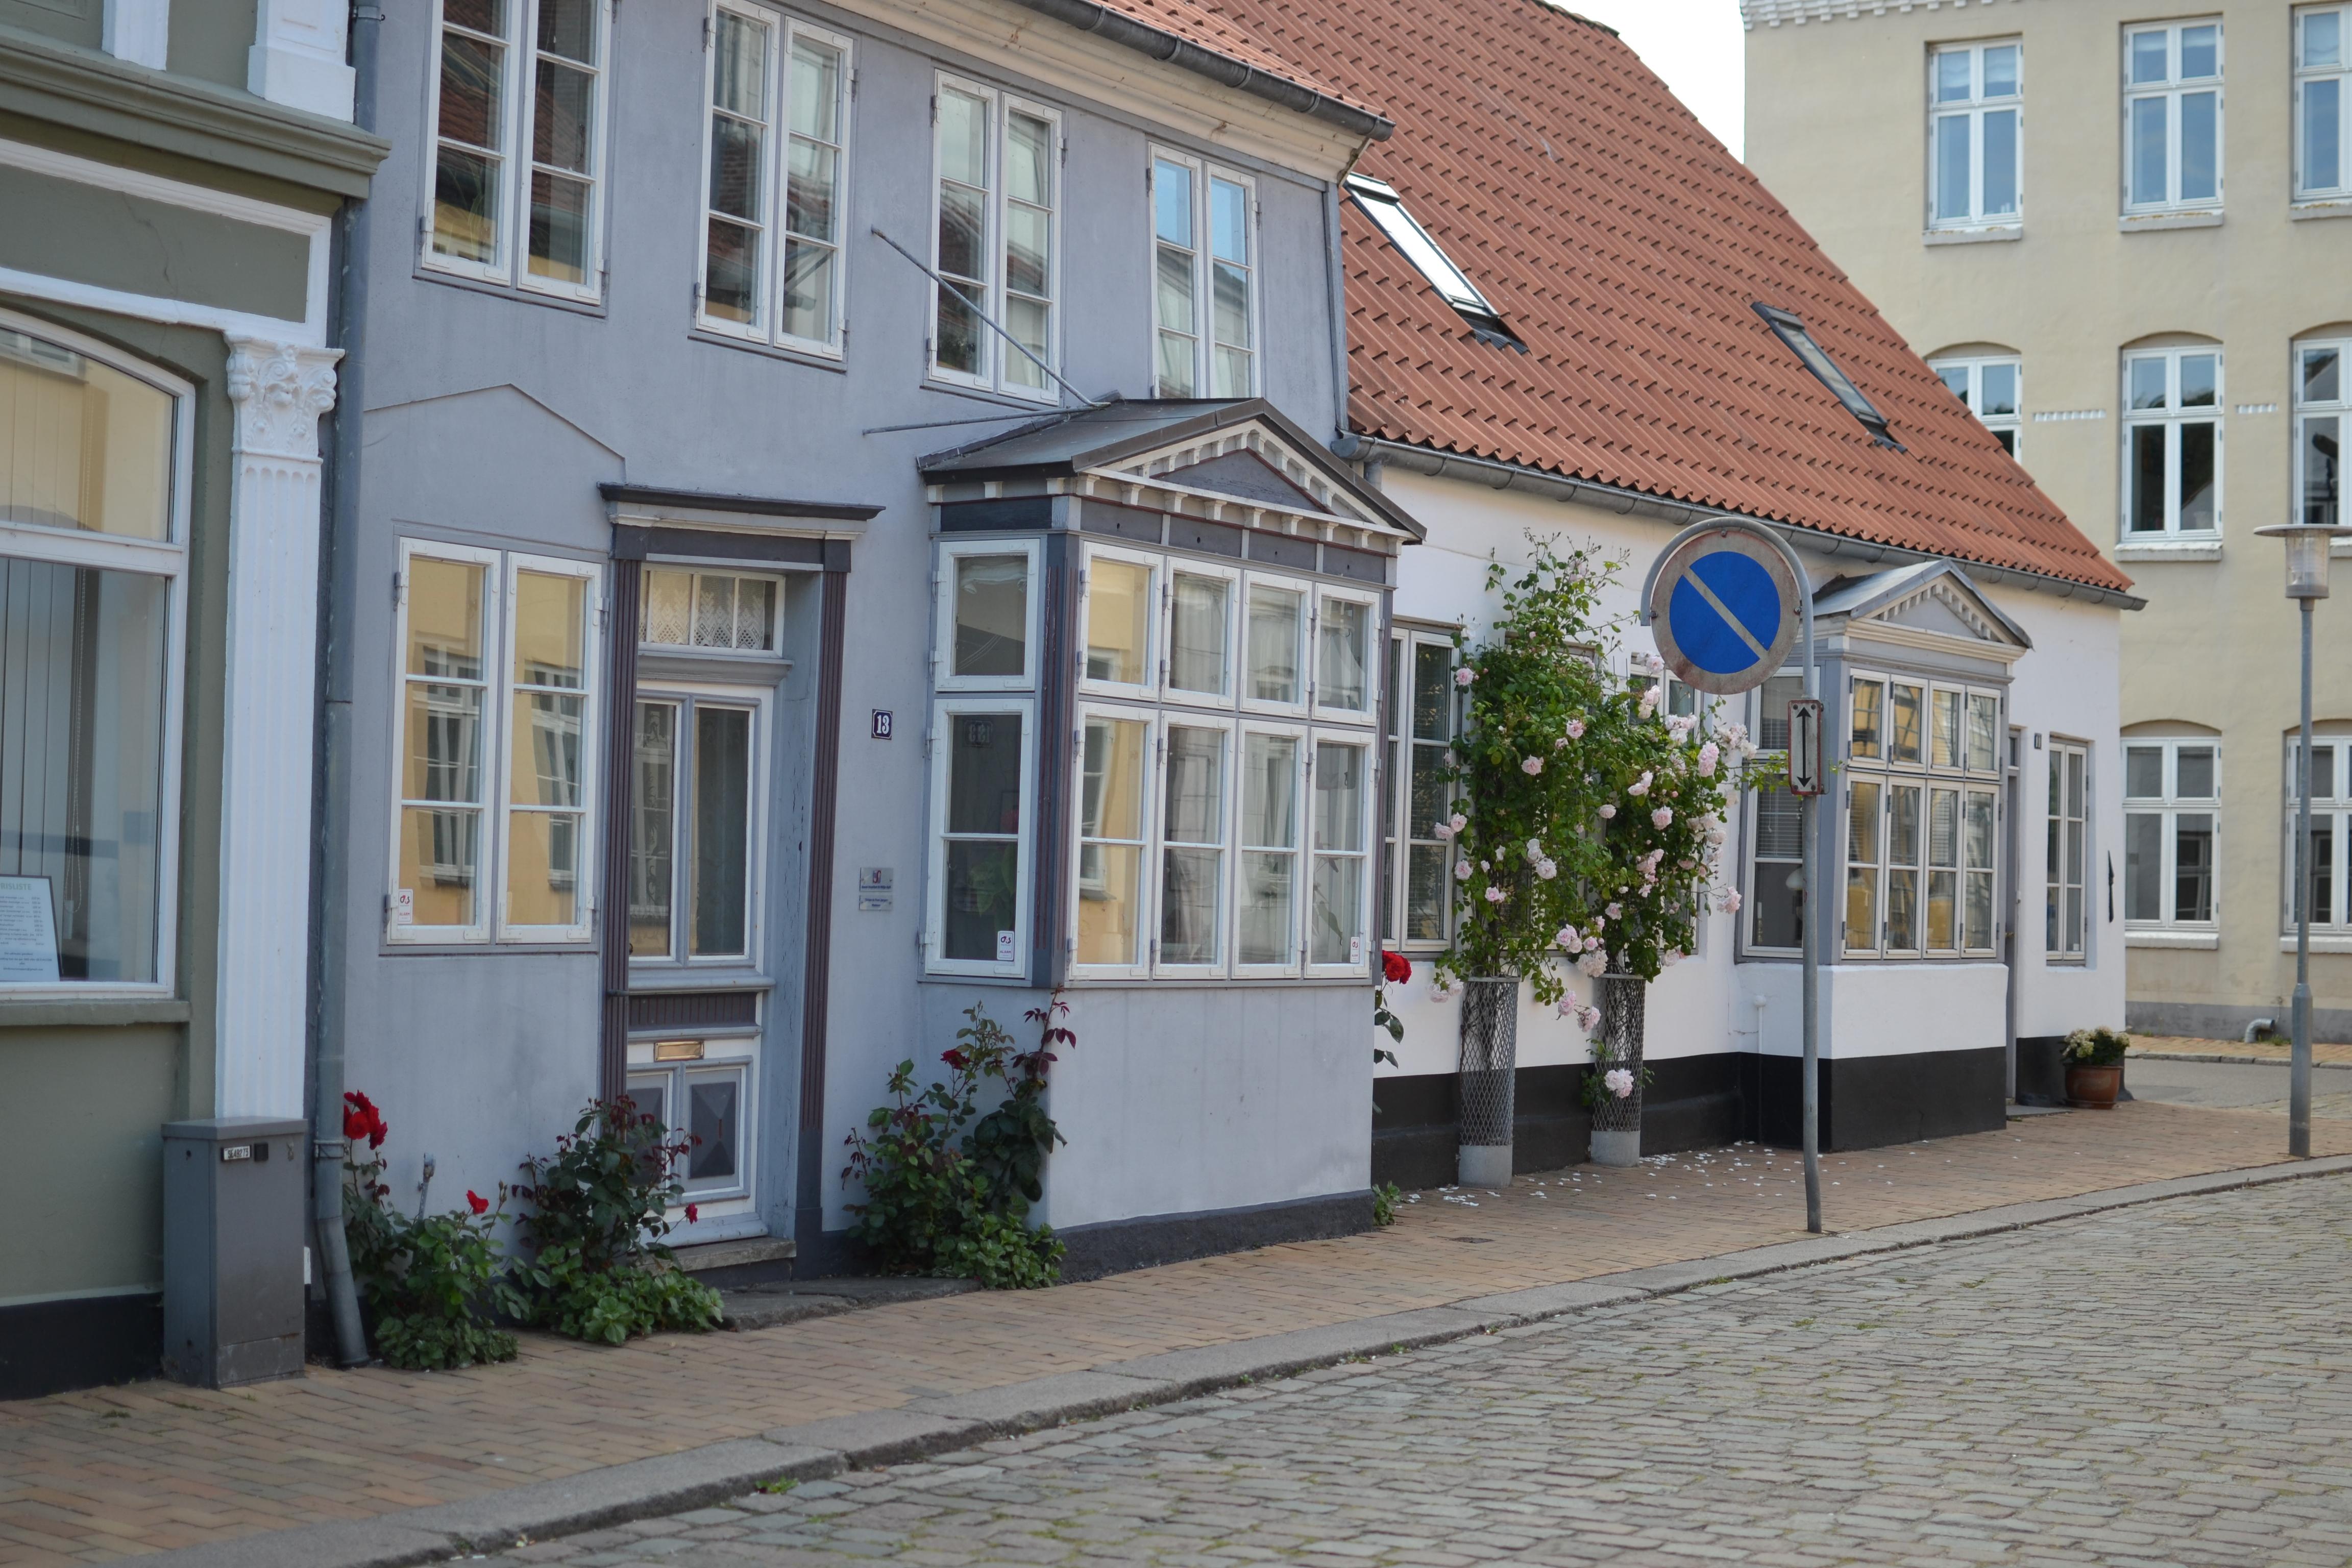 Sønderjylland: <strong>Kolonihaveliv i Tønder</strong> 9